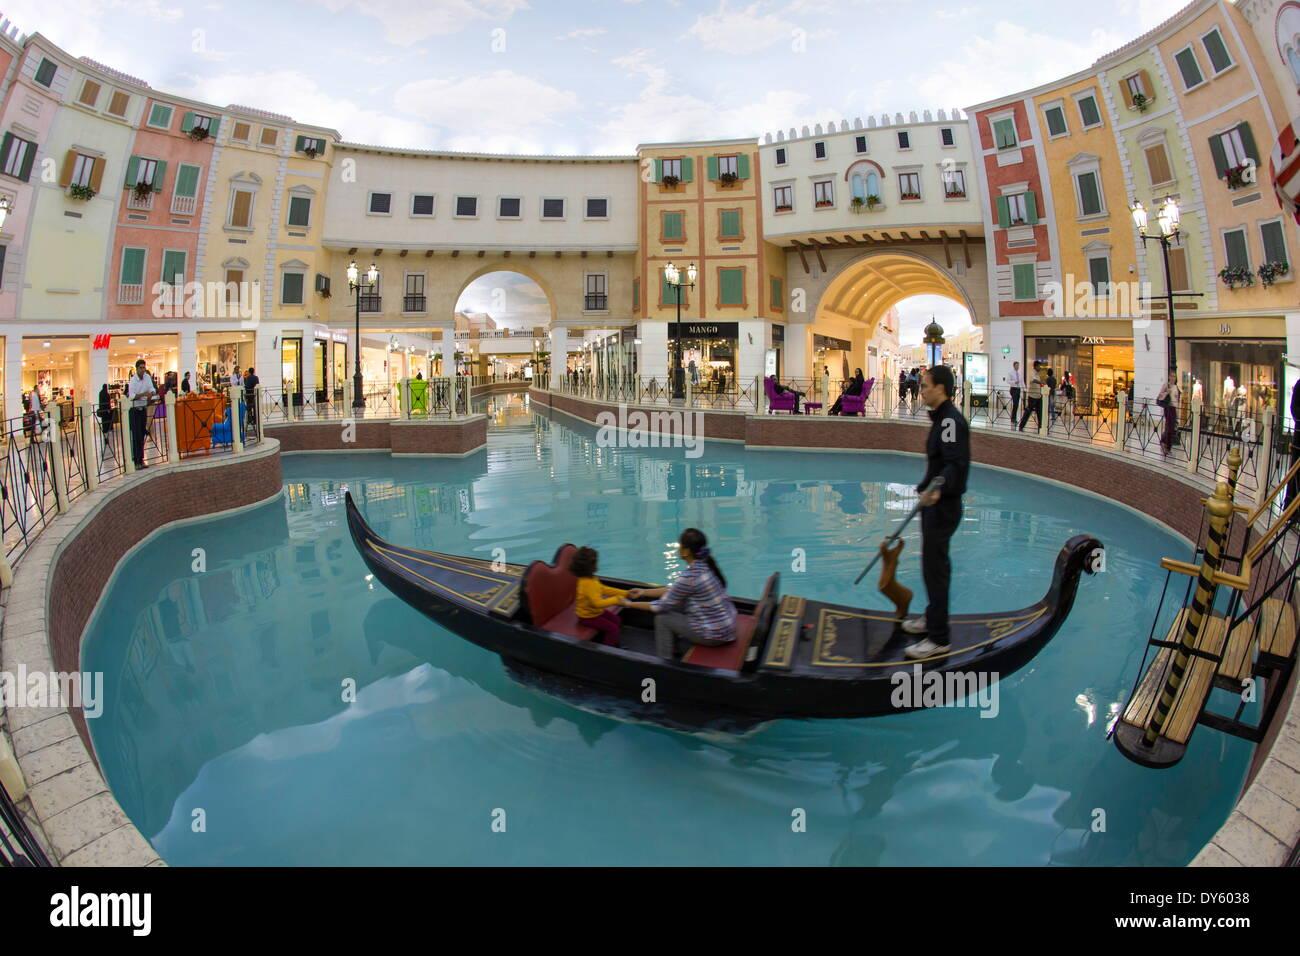 L'intérieur, Villaggio Mall, Doha, Qatar, Moyen-Orient Photo Stock